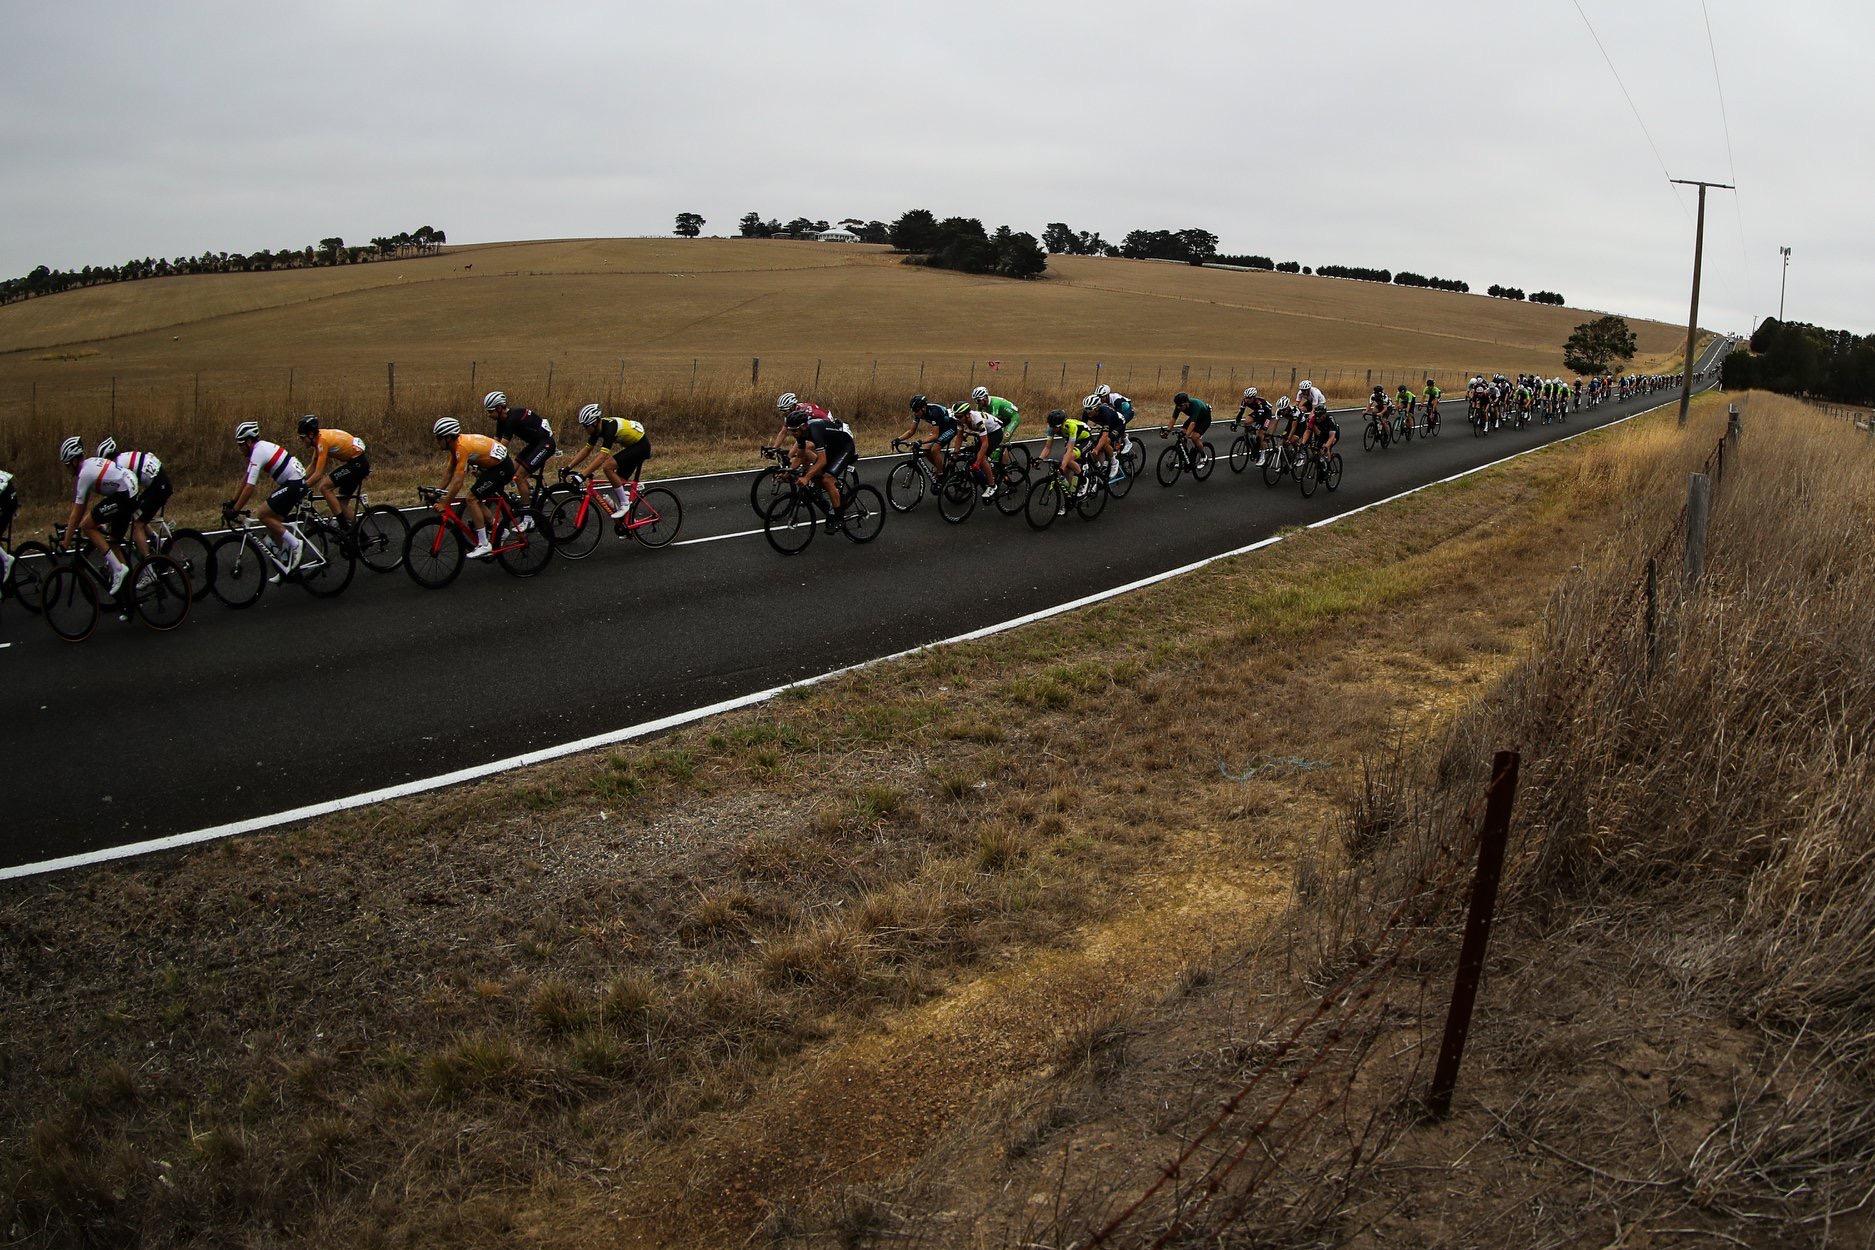 Con Chronis/ Cycling Australia